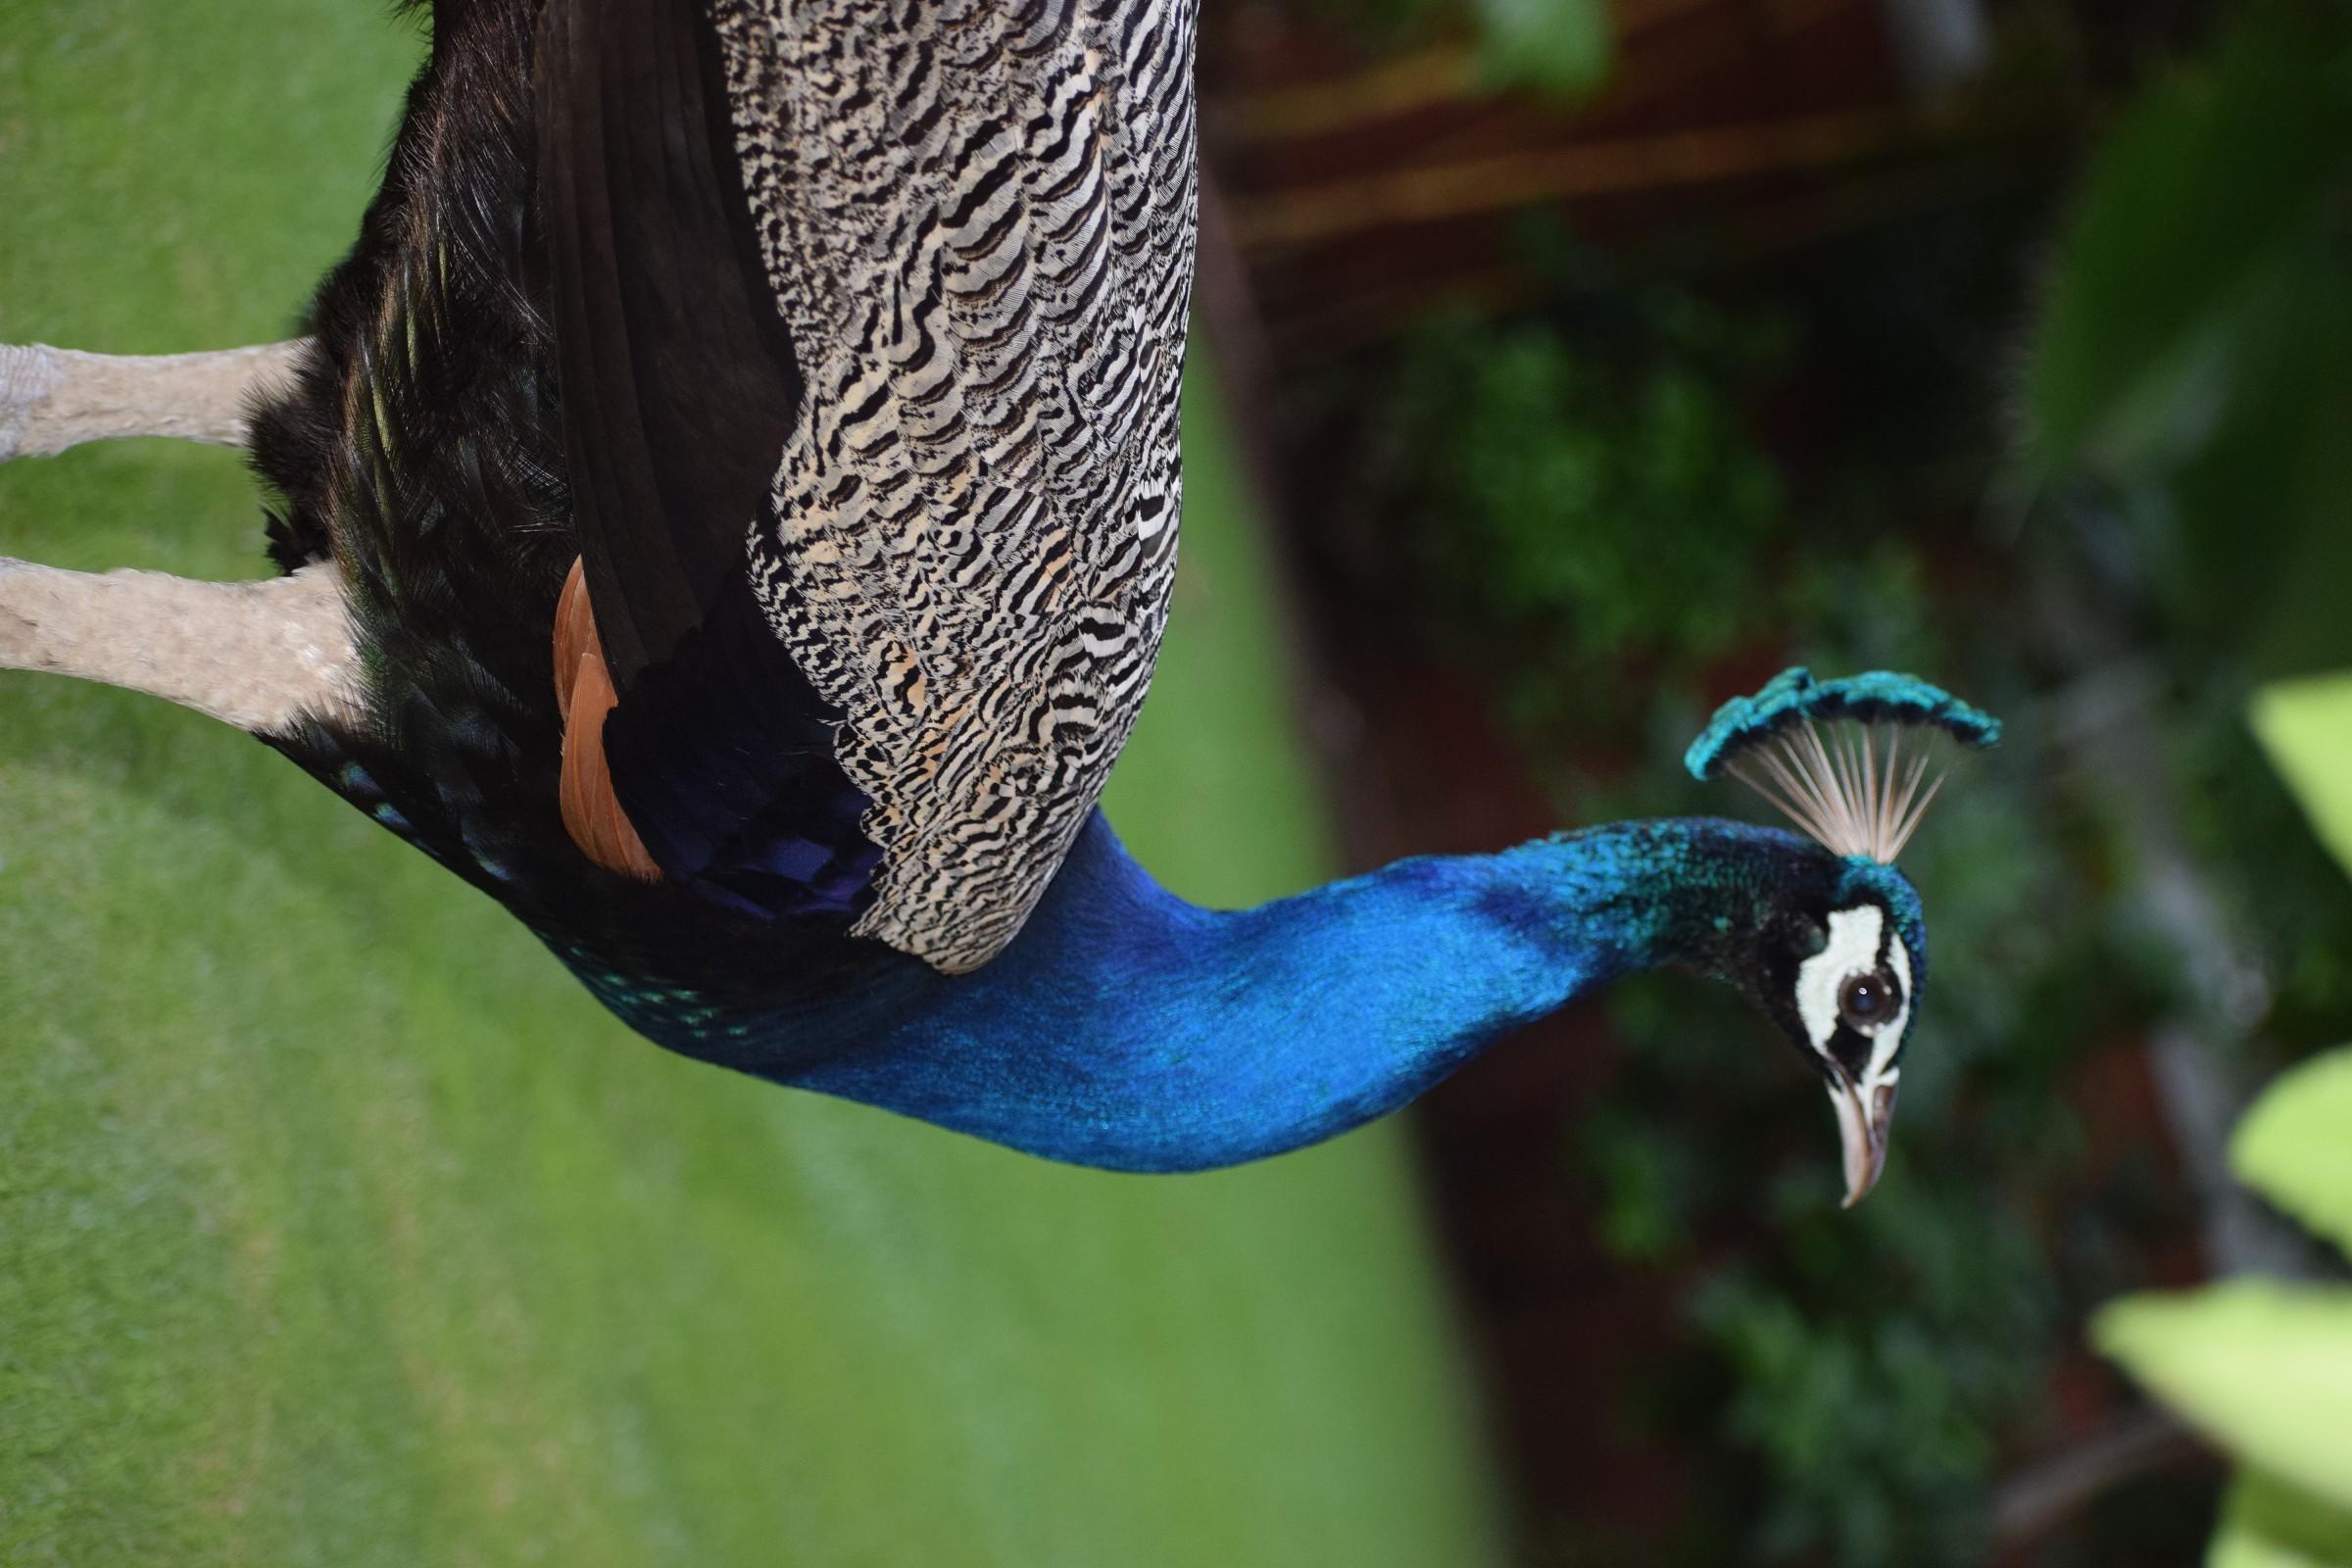 peacock random click